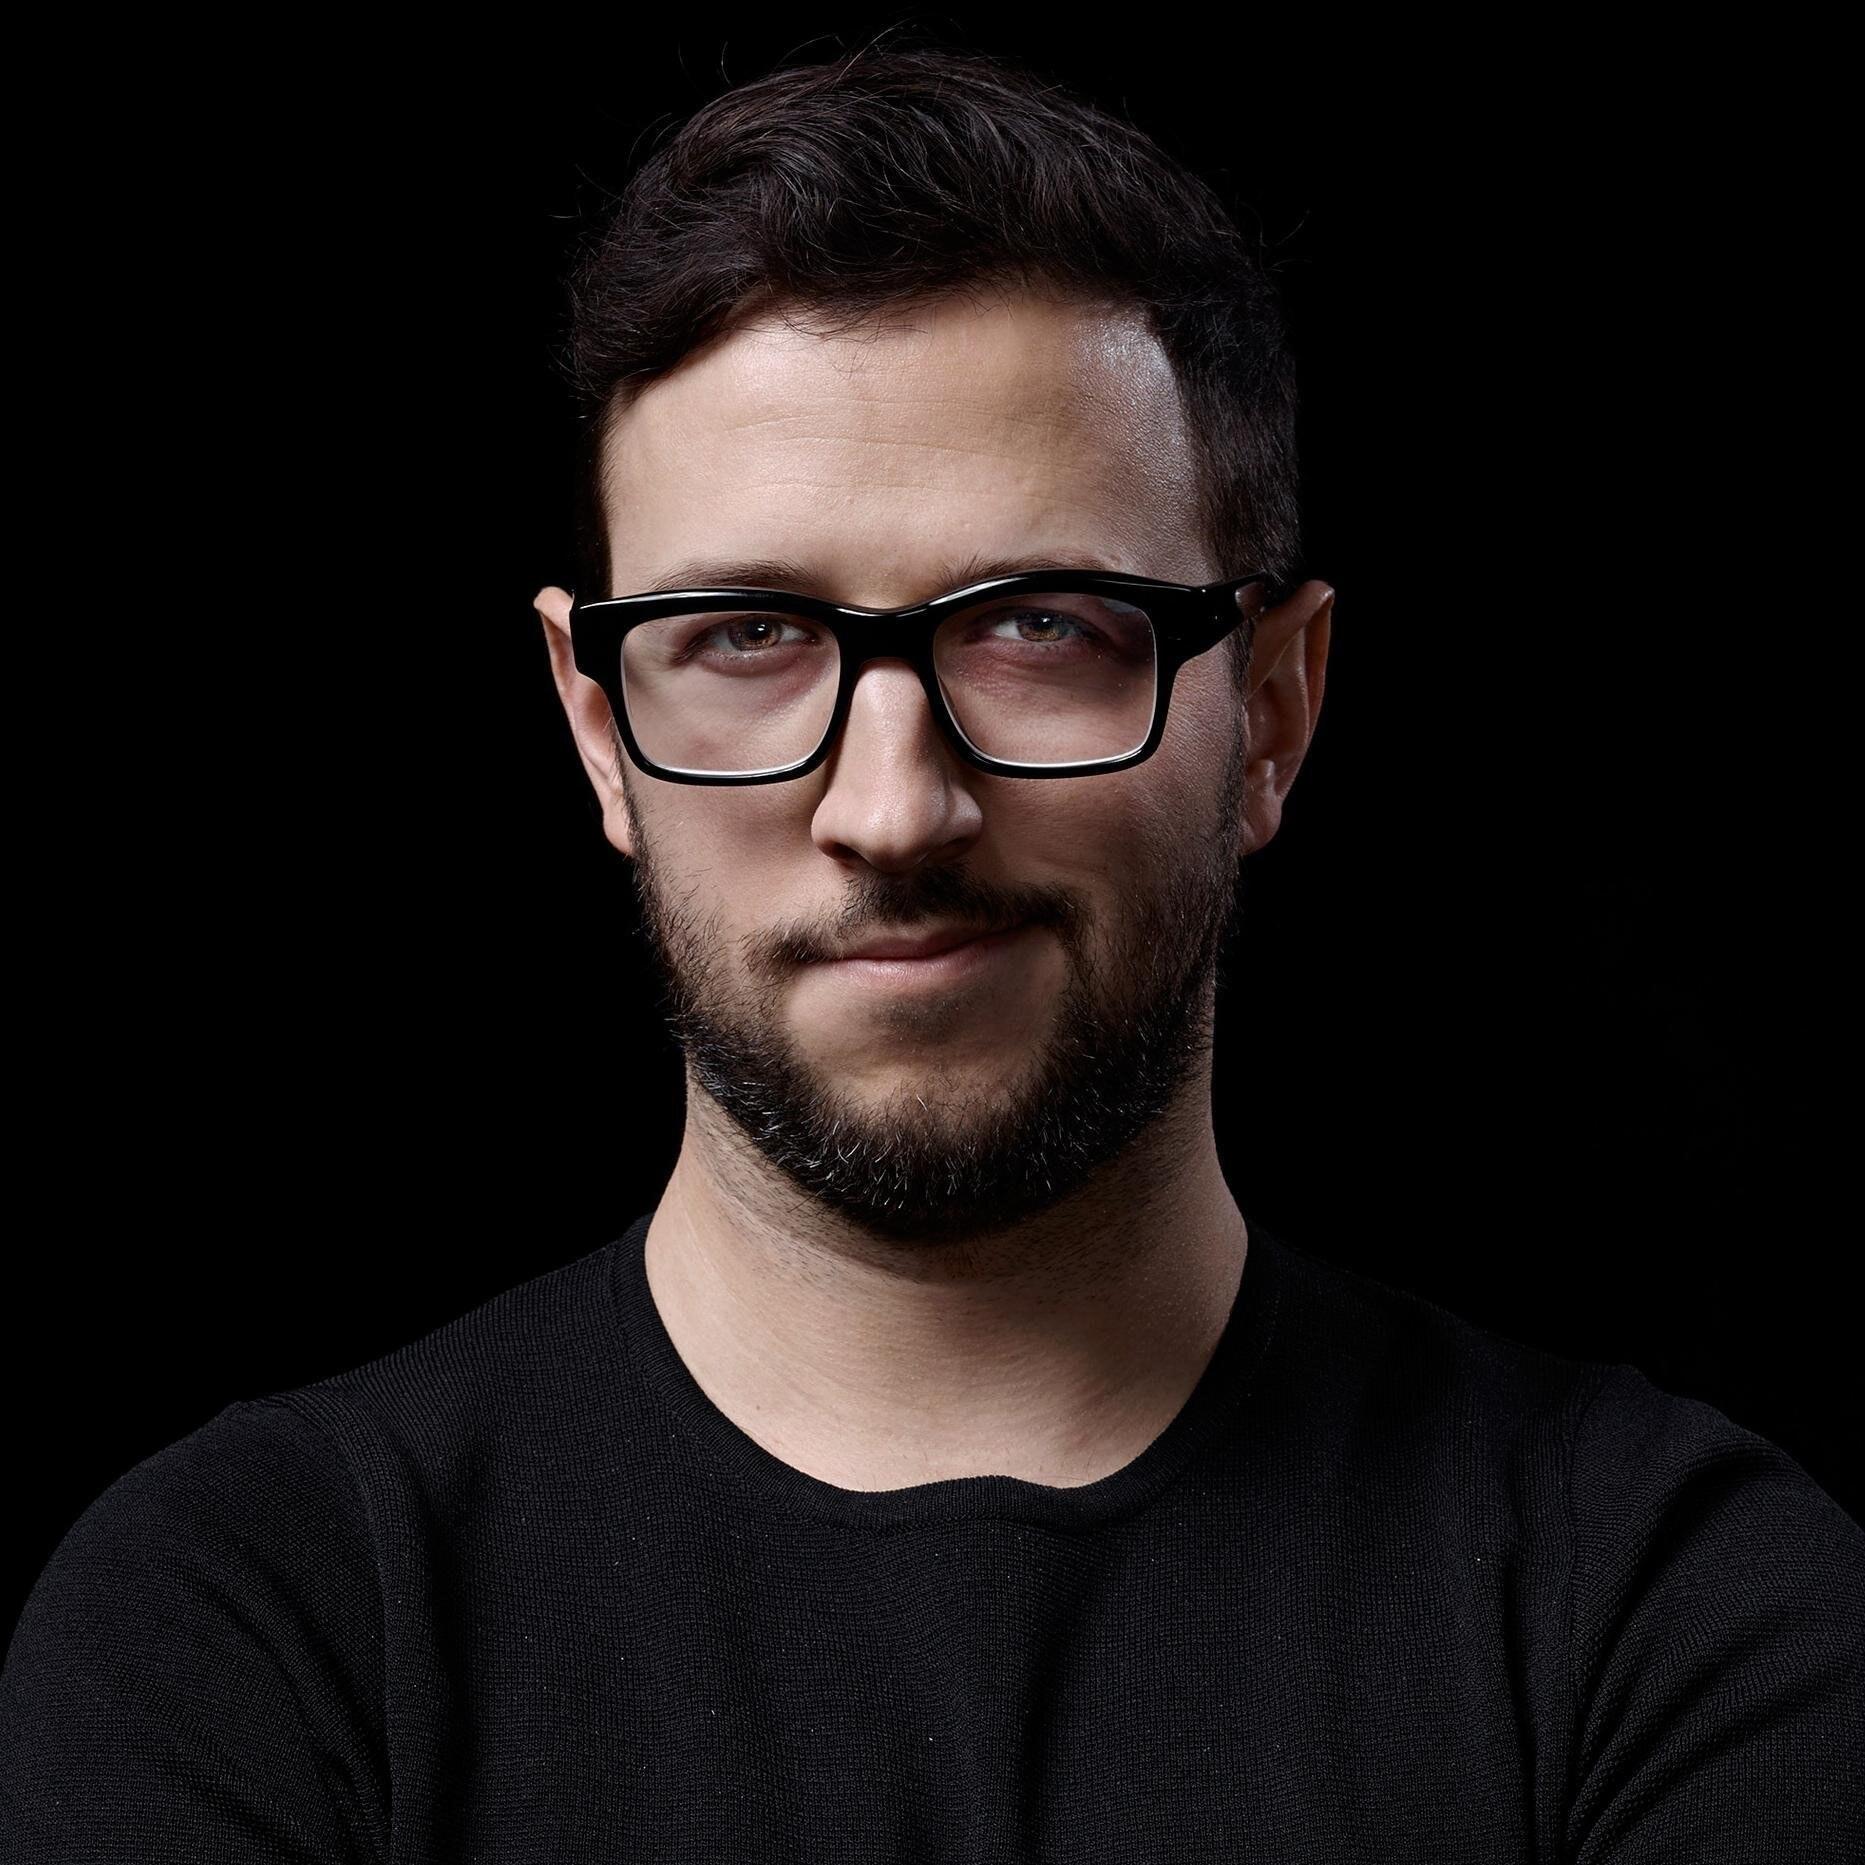 Adrian Belina